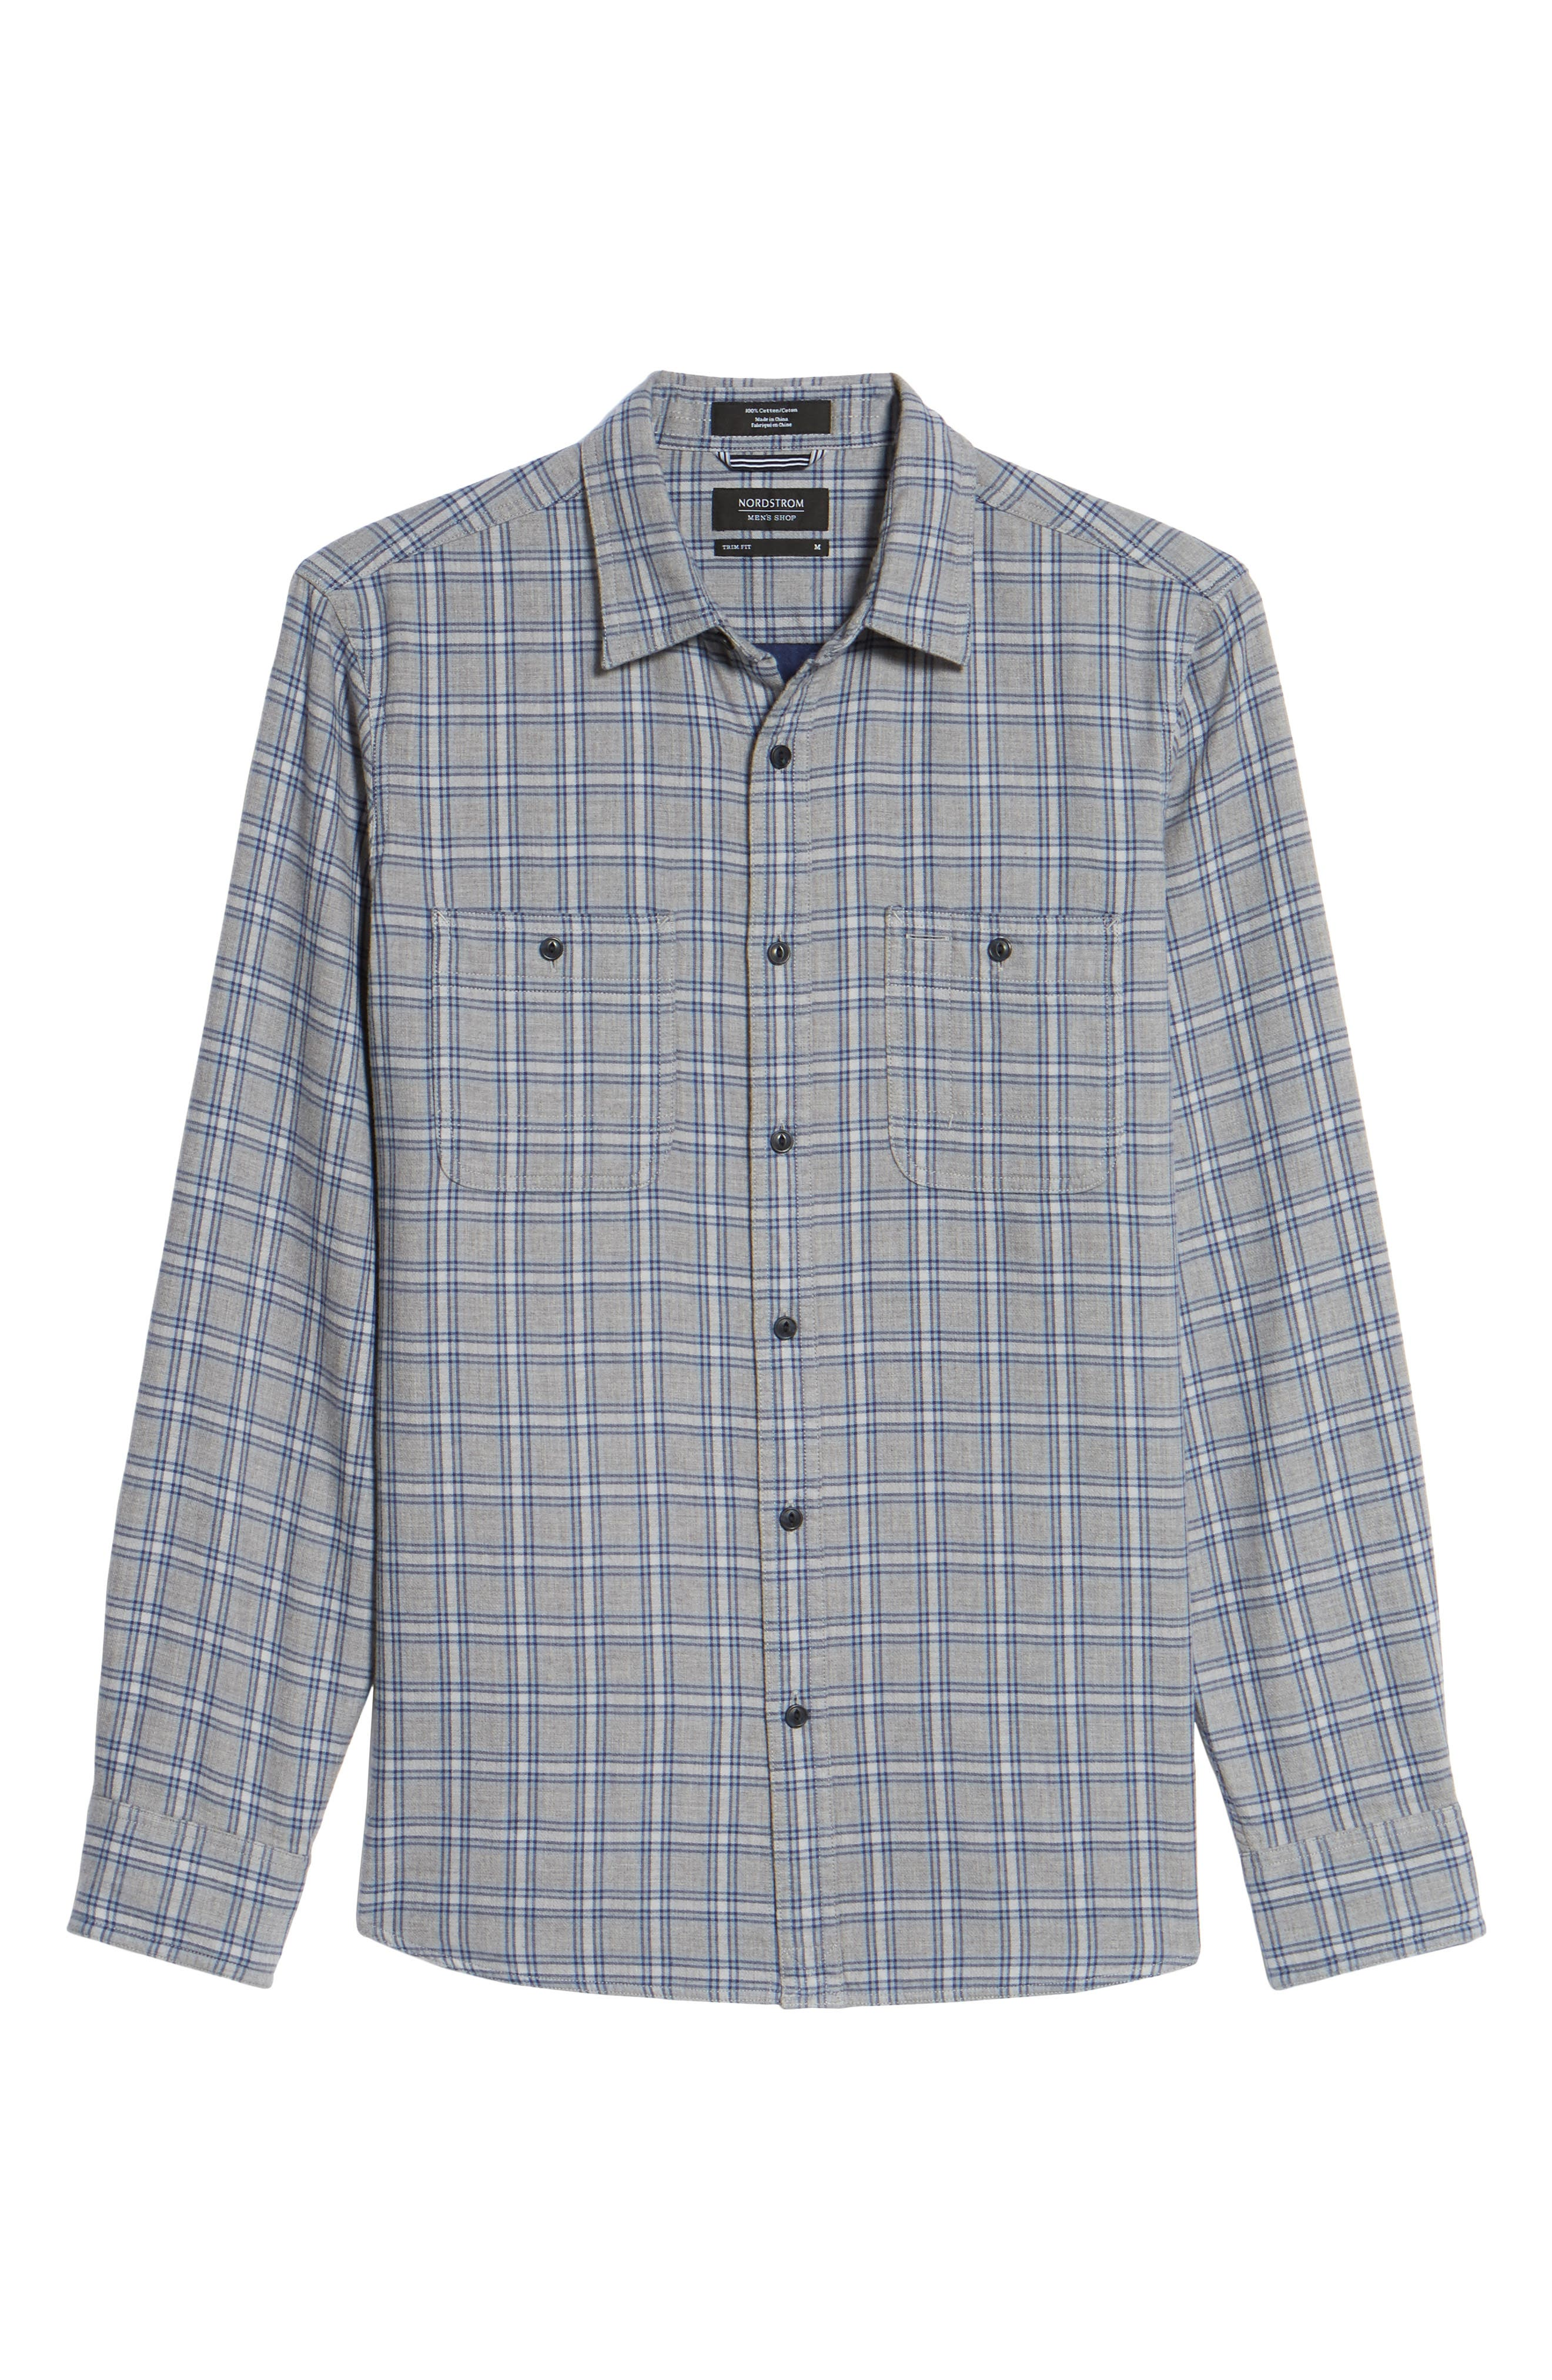 Workwear Duofold Check Sport Shirt,                             Alternate thumbnail 6, color,                             Navy Iris Grey Plaid Duofold